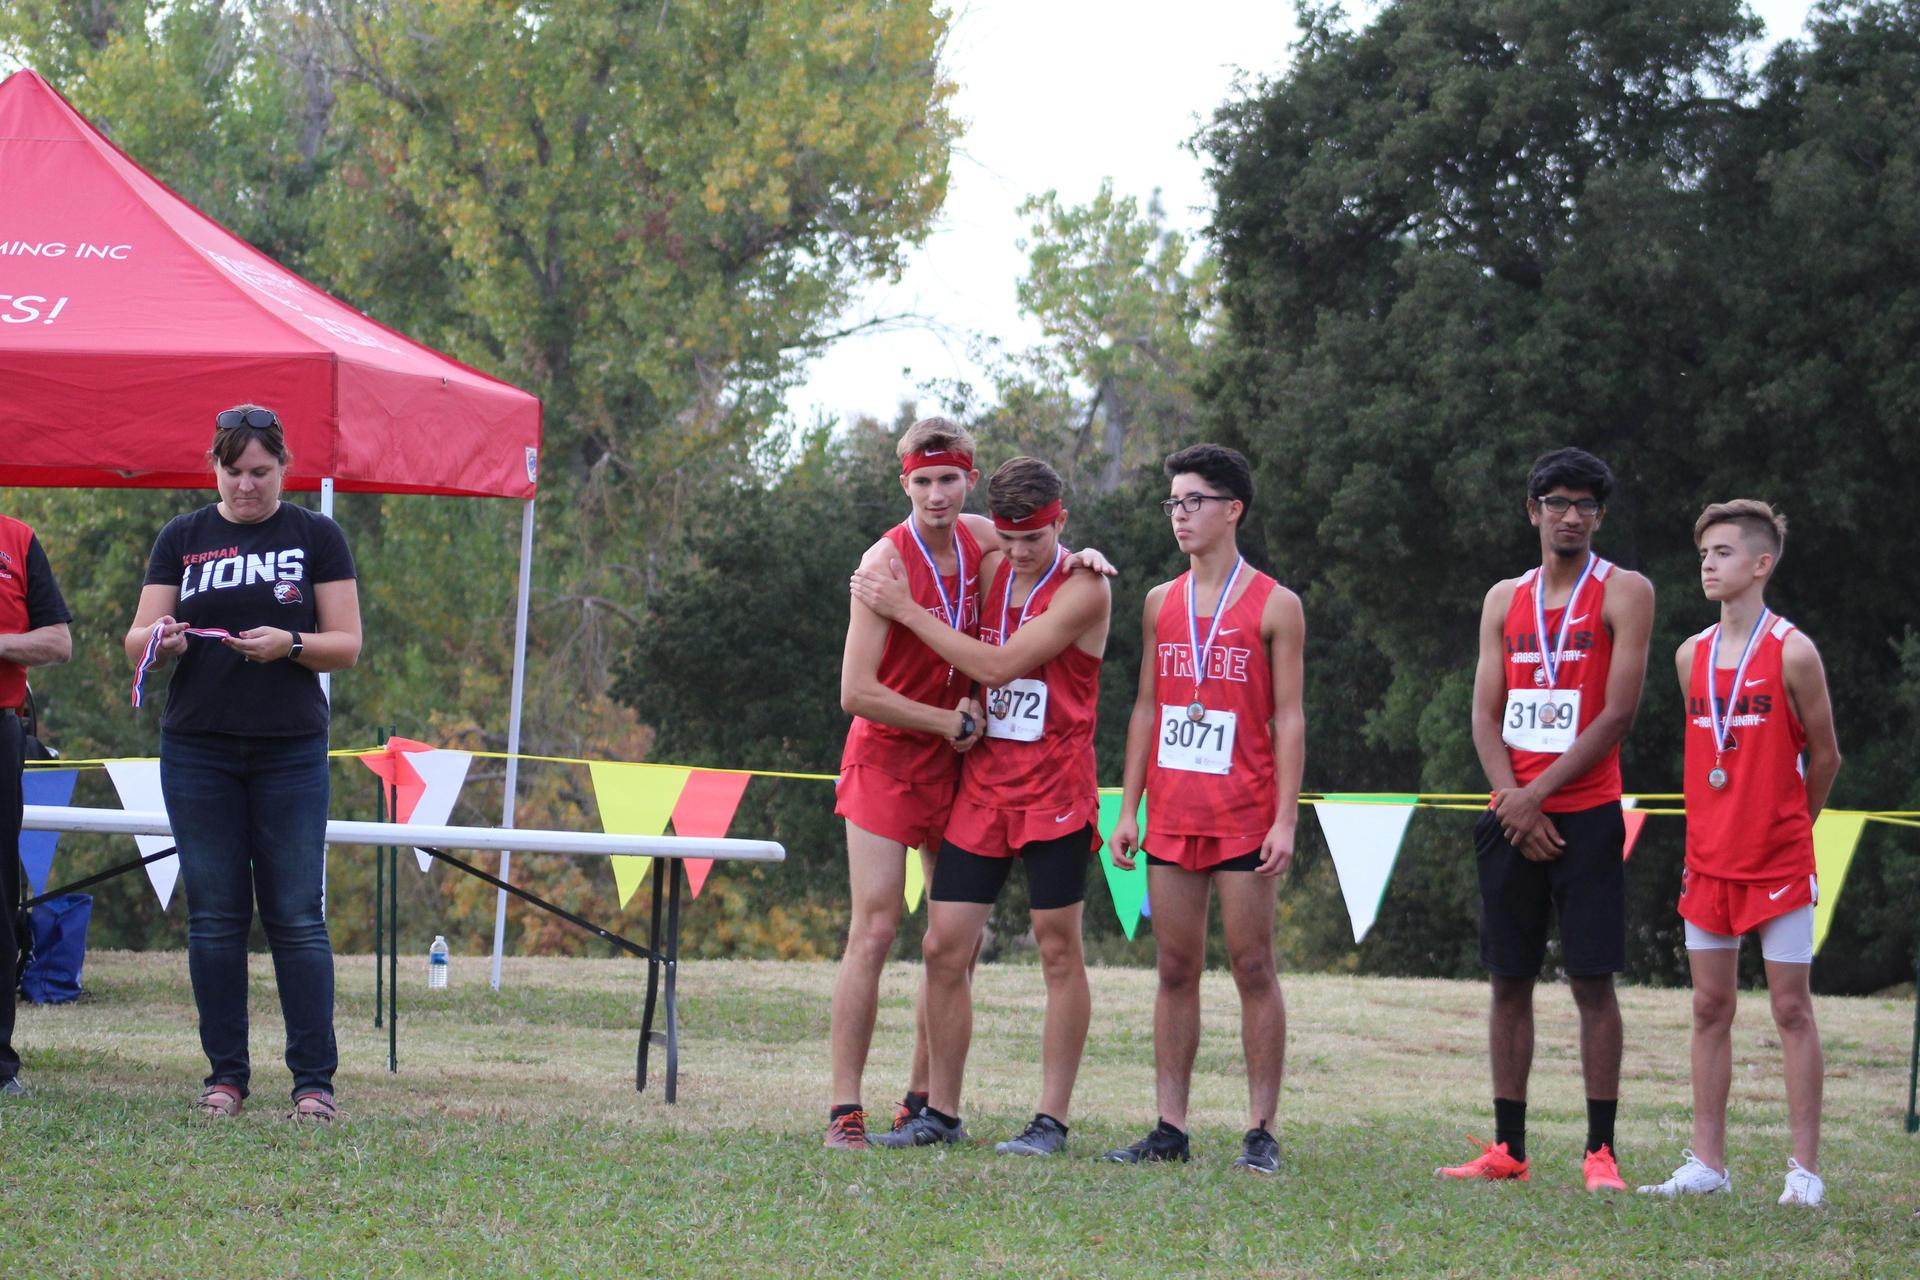 Michael Eggert shaking teammate's hand after receiving medal